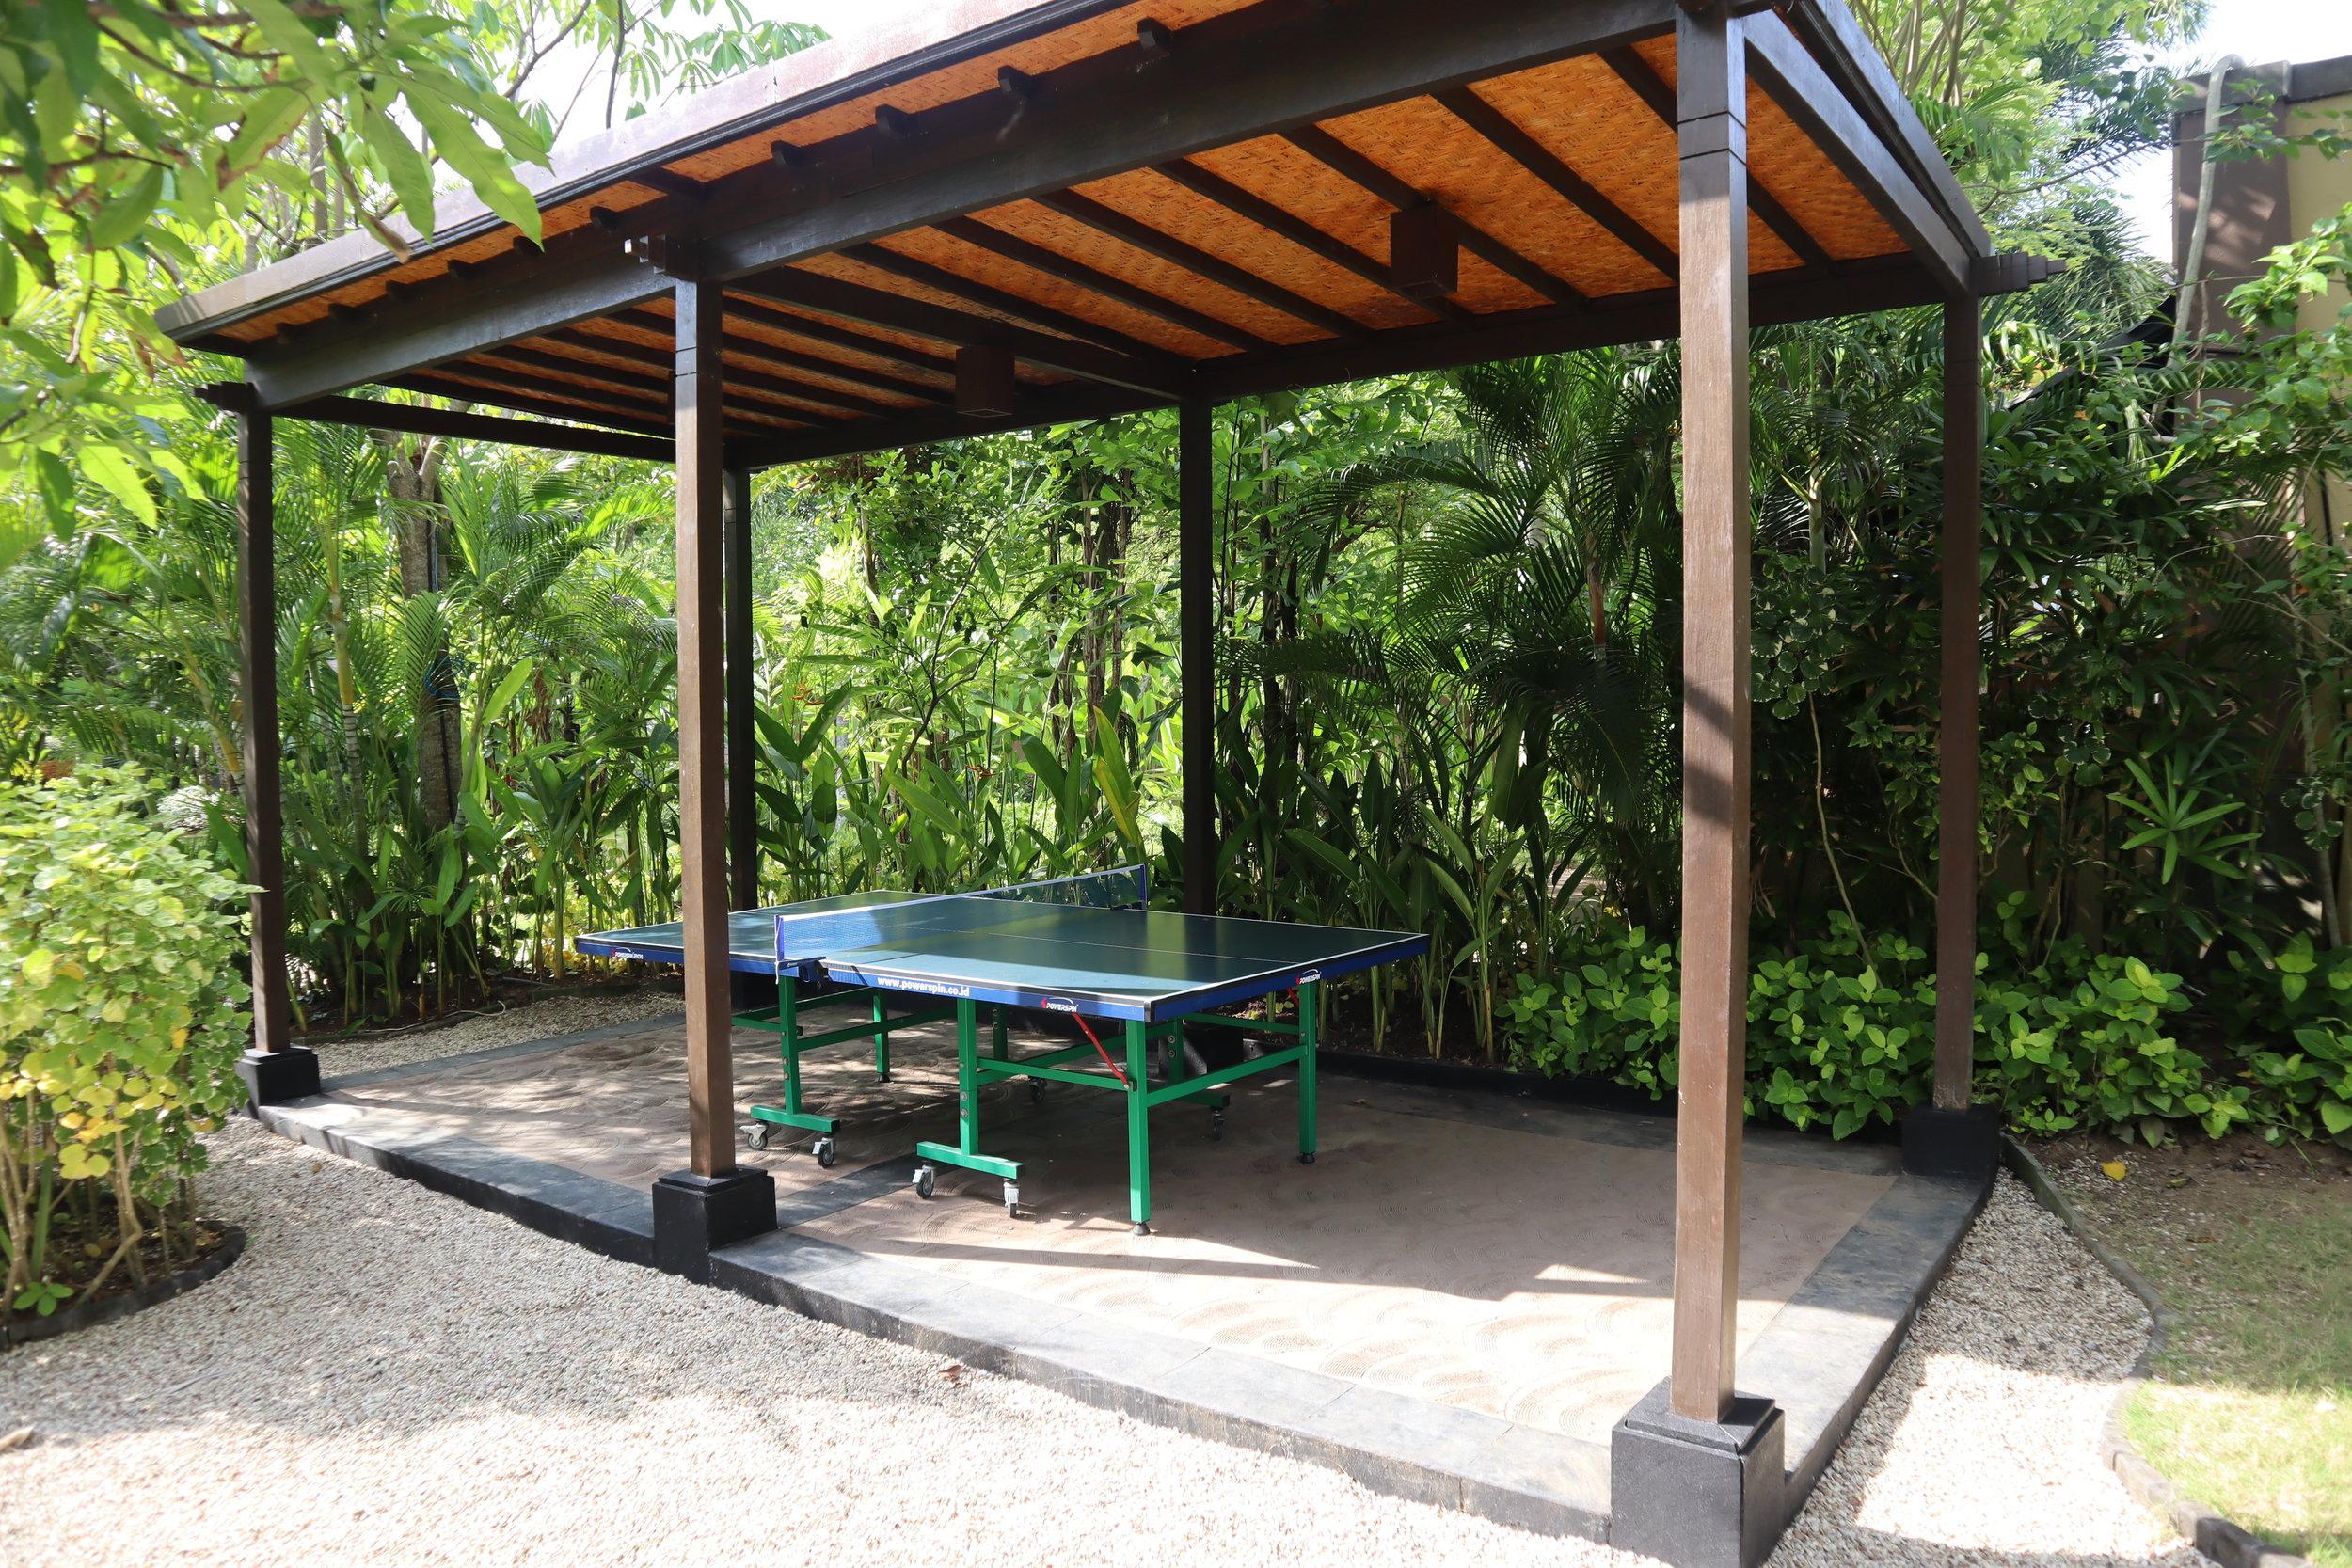 St. Regis Bali – Ping-pong table